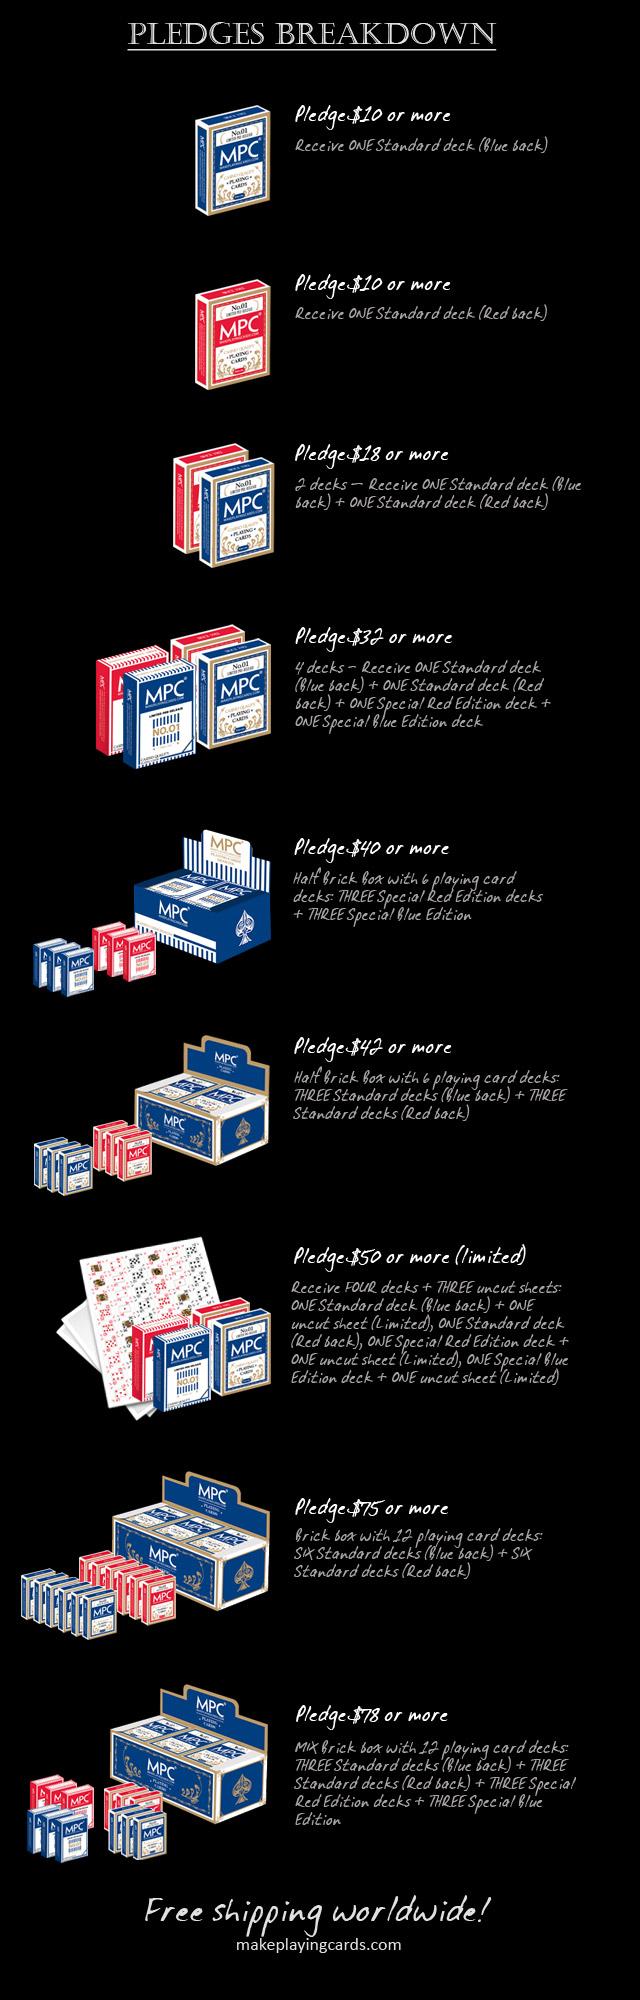 kickstarter playing cards Pledges breakdown